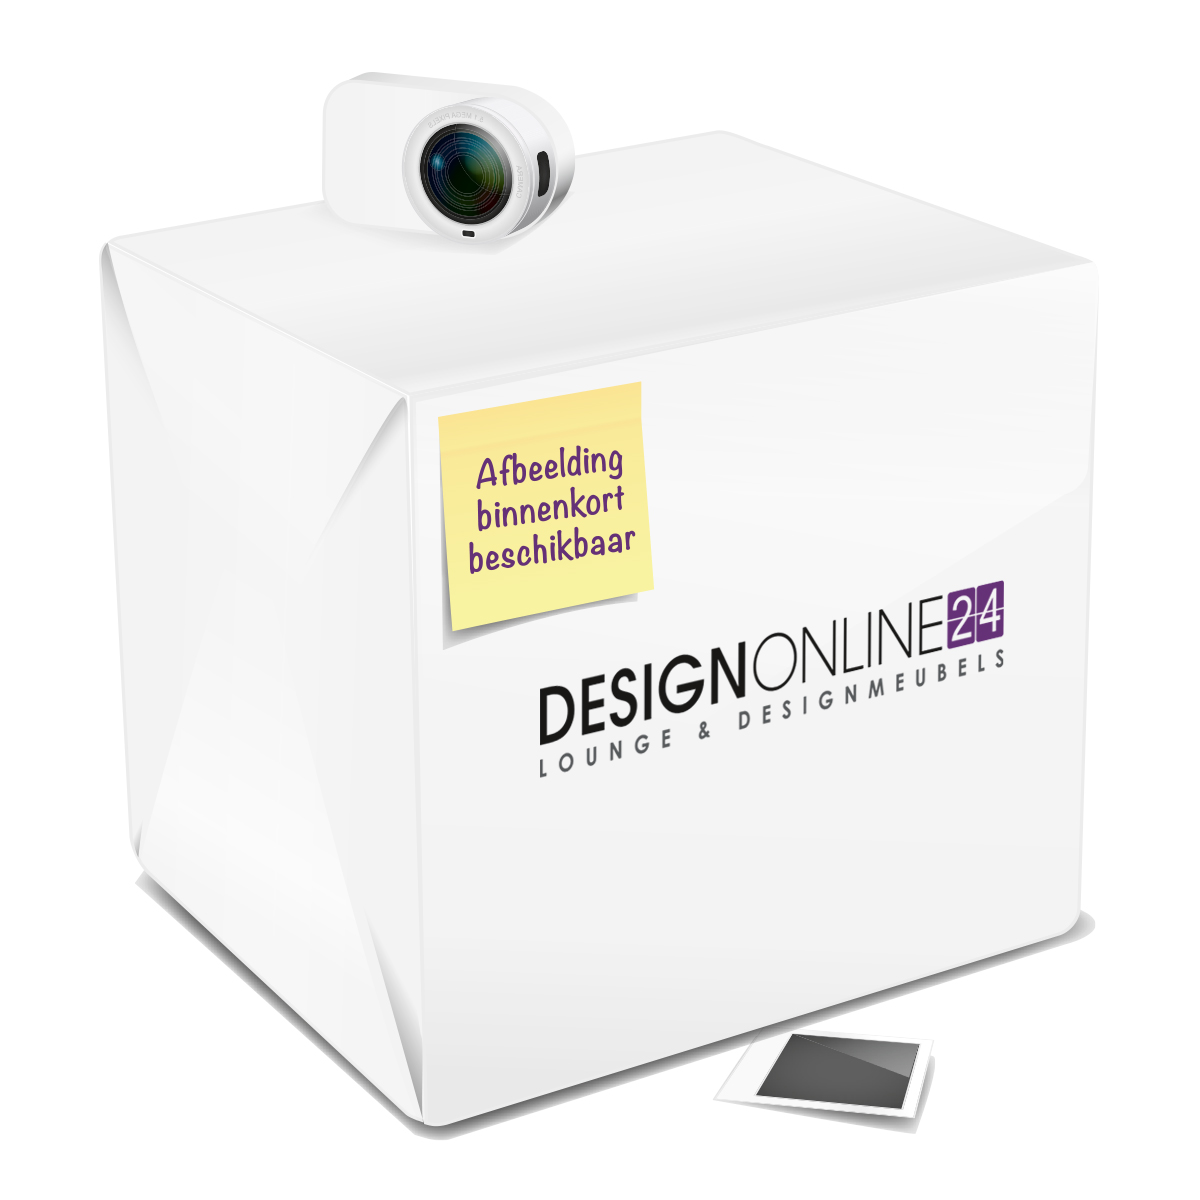 Innovation Slaapbank Splitback Armleuningen - Styletto Poten Donker - Mixed Dance 521 - Grijs